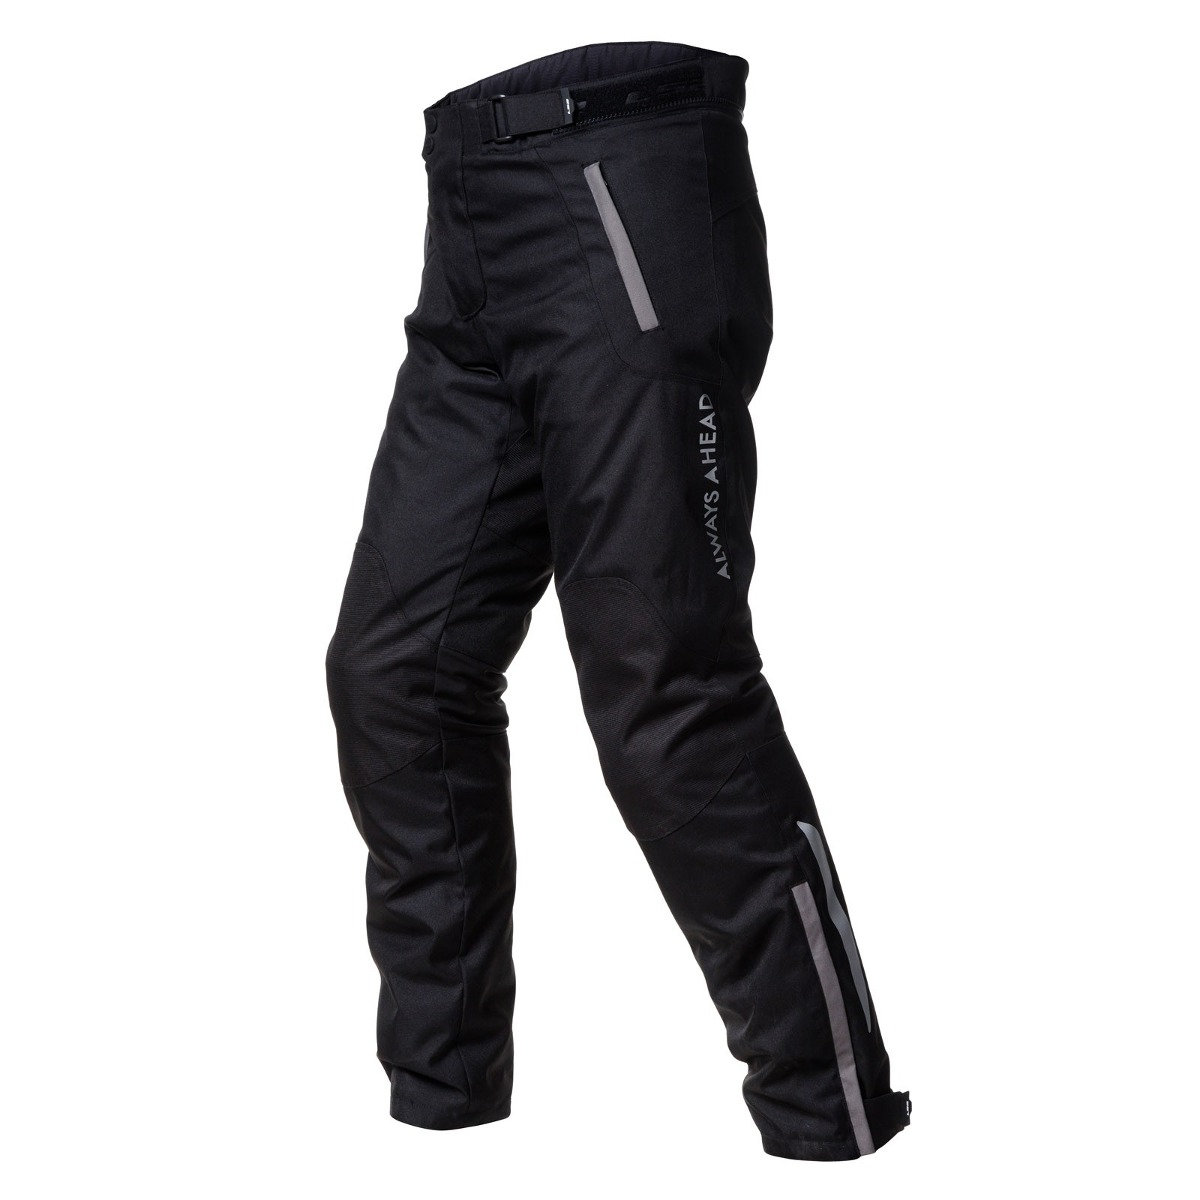 pantalon ls2 chart negro hombre talle s